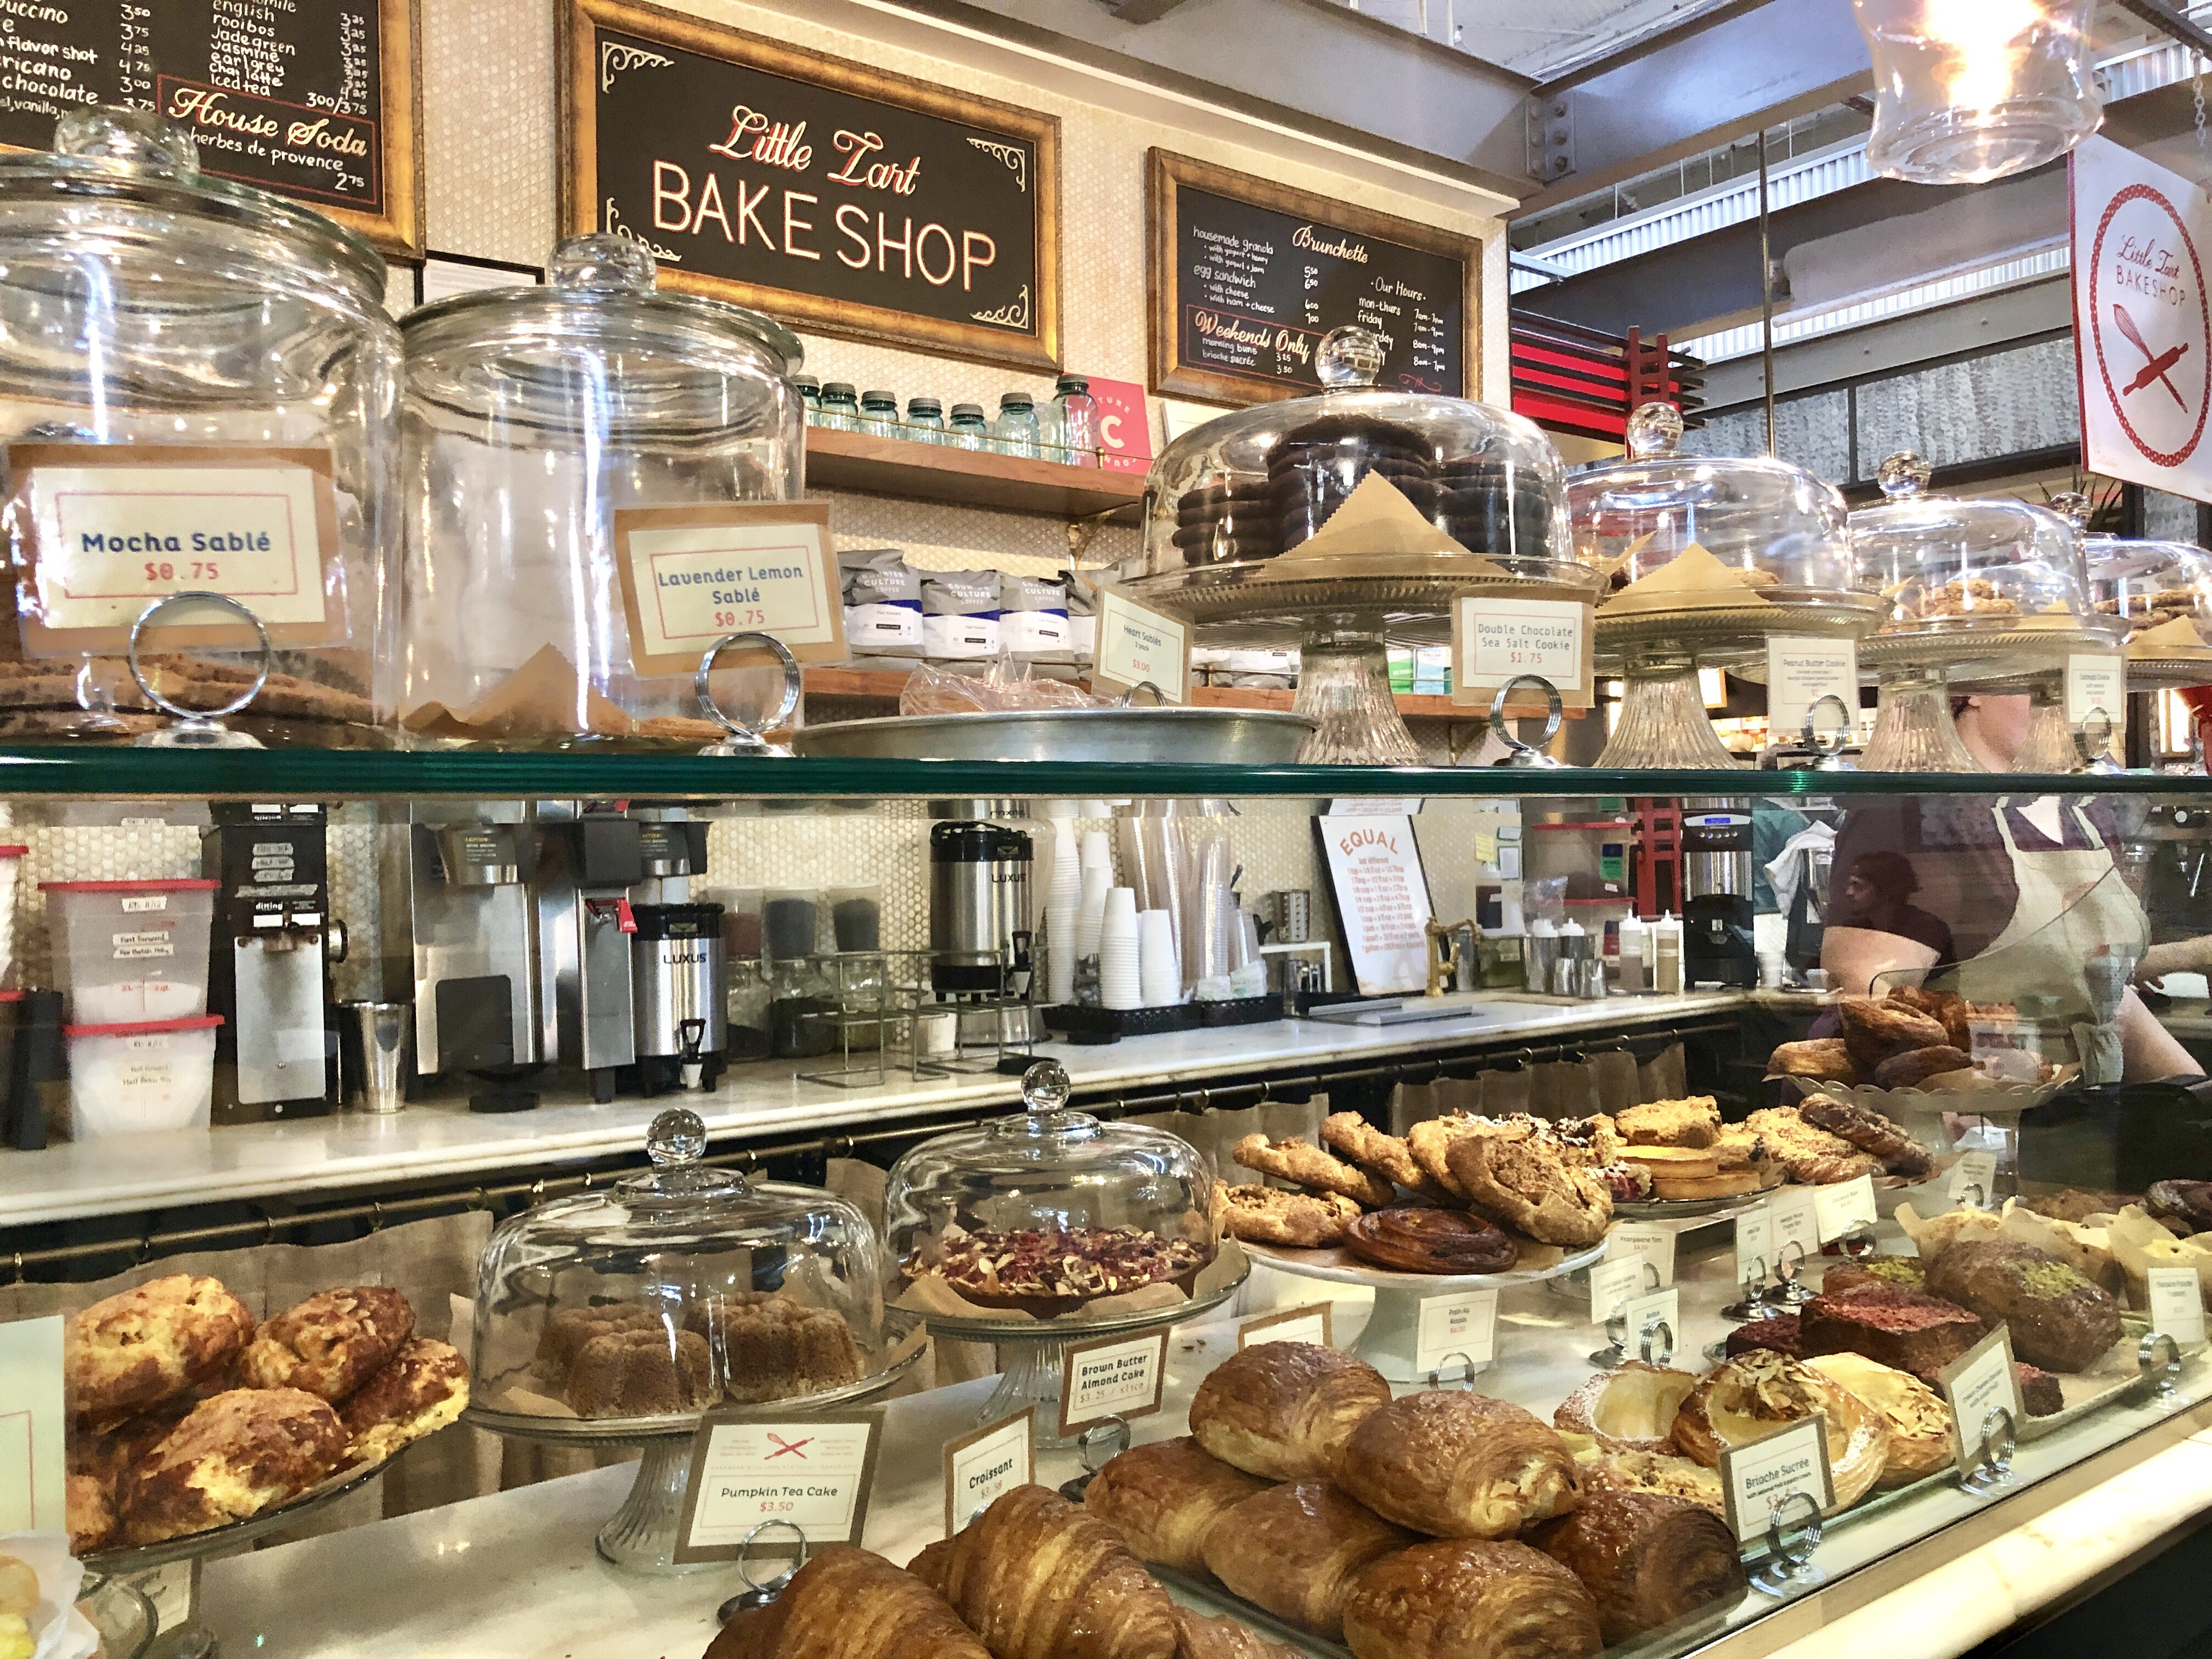 Breakfast at Little Tart Bakeshop at Krog Street Market in Atlanta